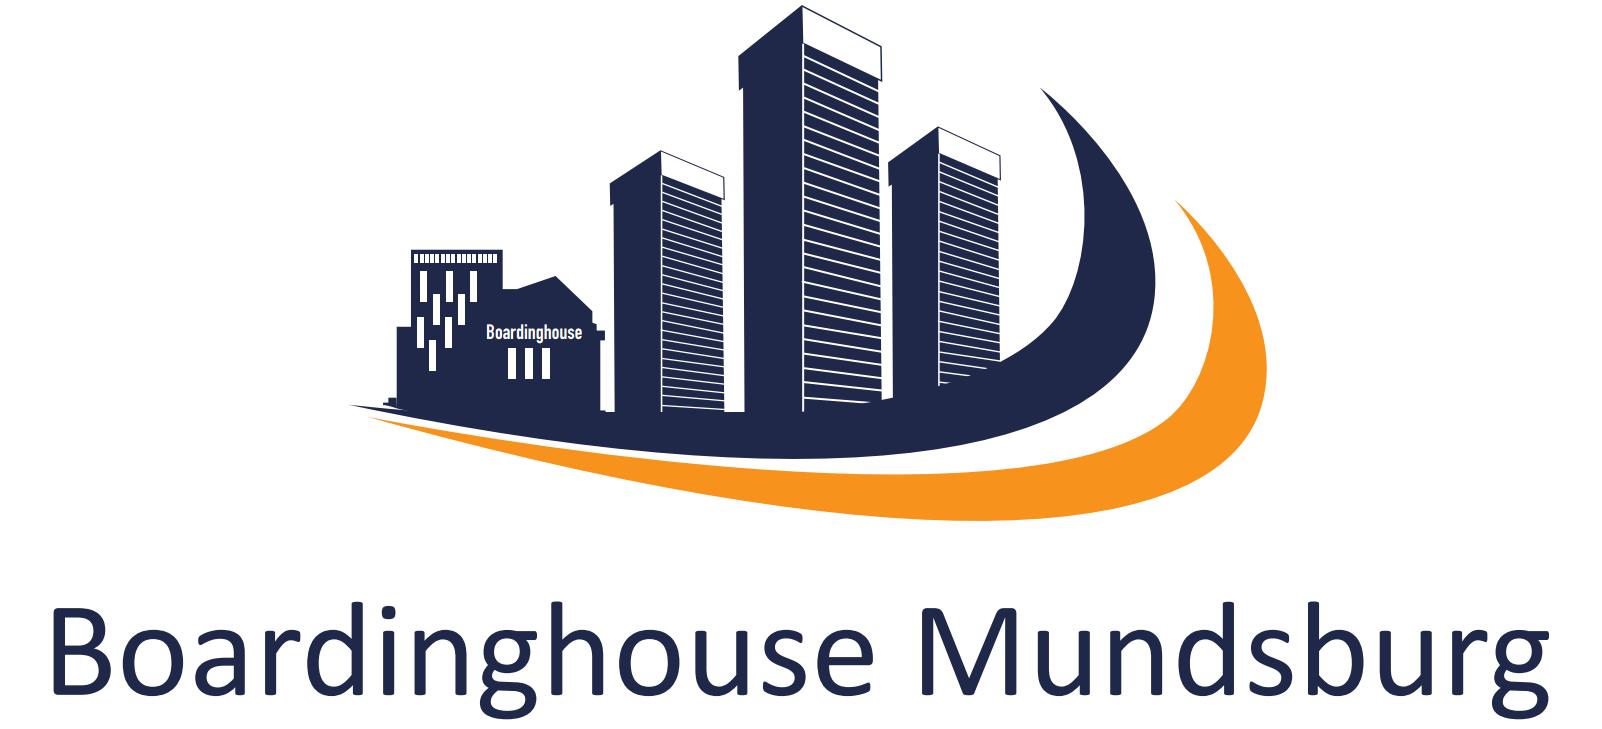 Boardinghouse Hamburg Mundsburg